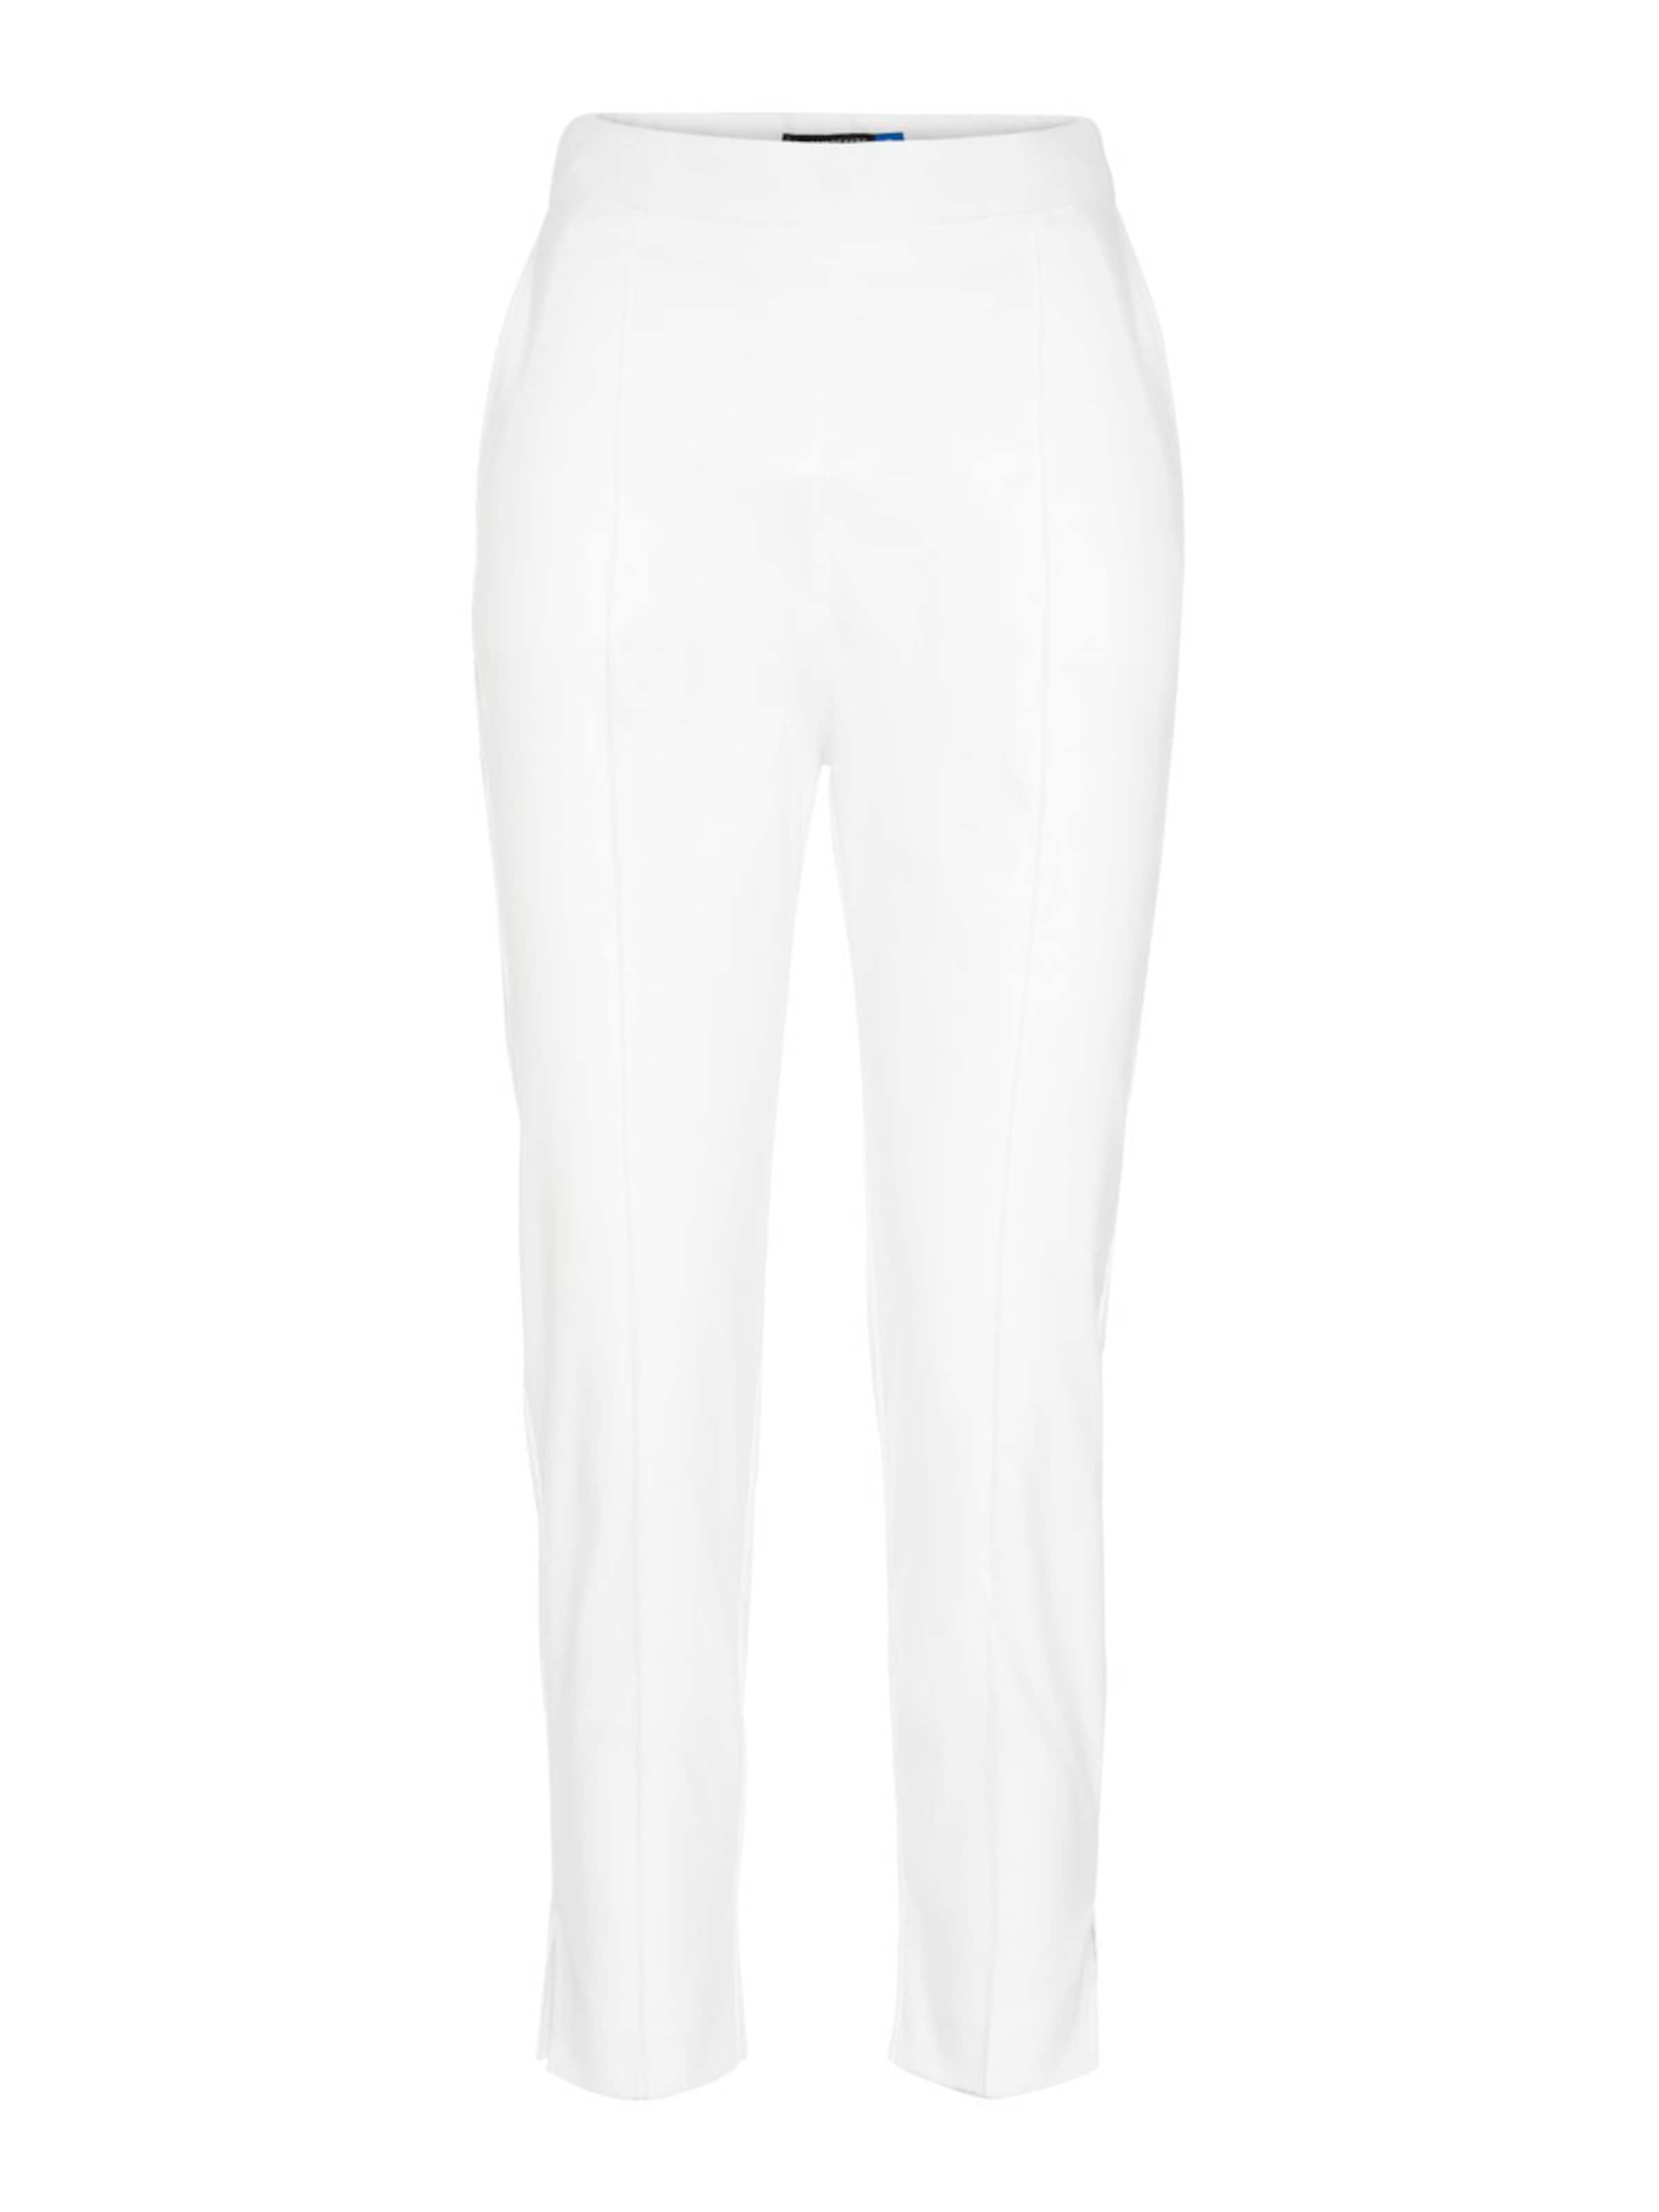 lindeberg Pantalon Schoeller' J 'stella En Blanc TKJlFc1